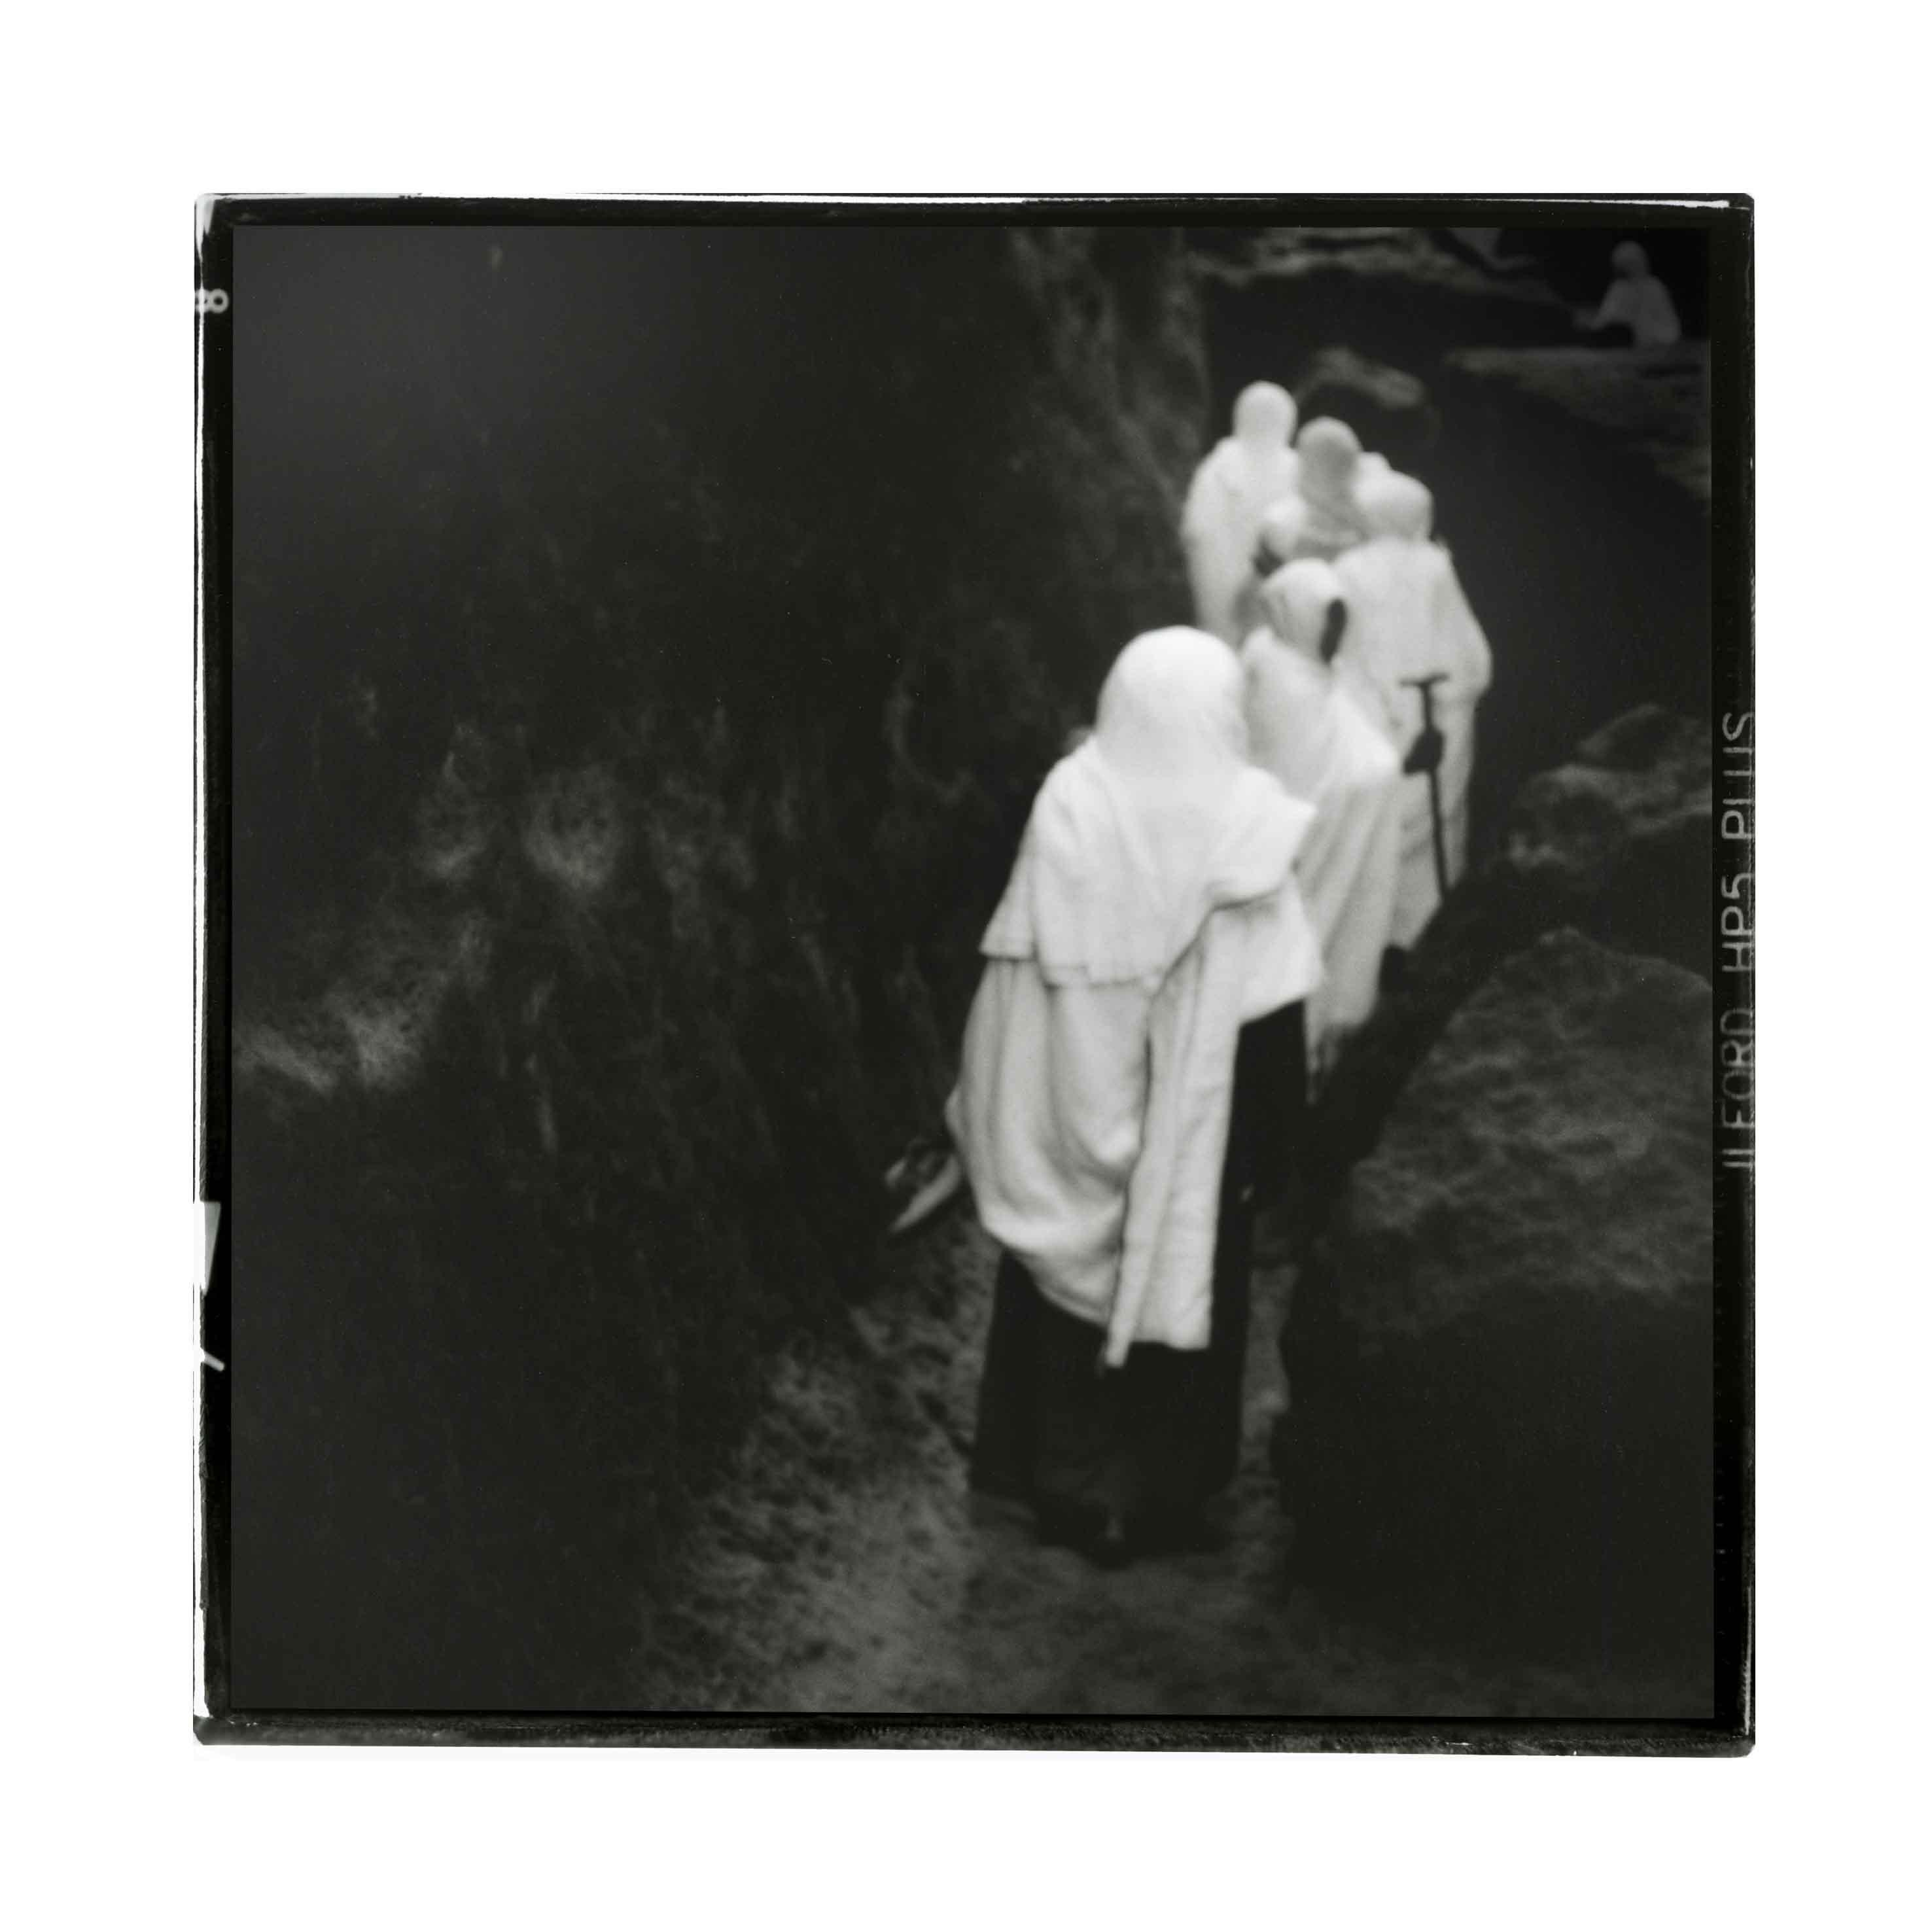 Etíope 24, 2012<br/>Gelatinoclorobromuro de plata / Silver gelatin print